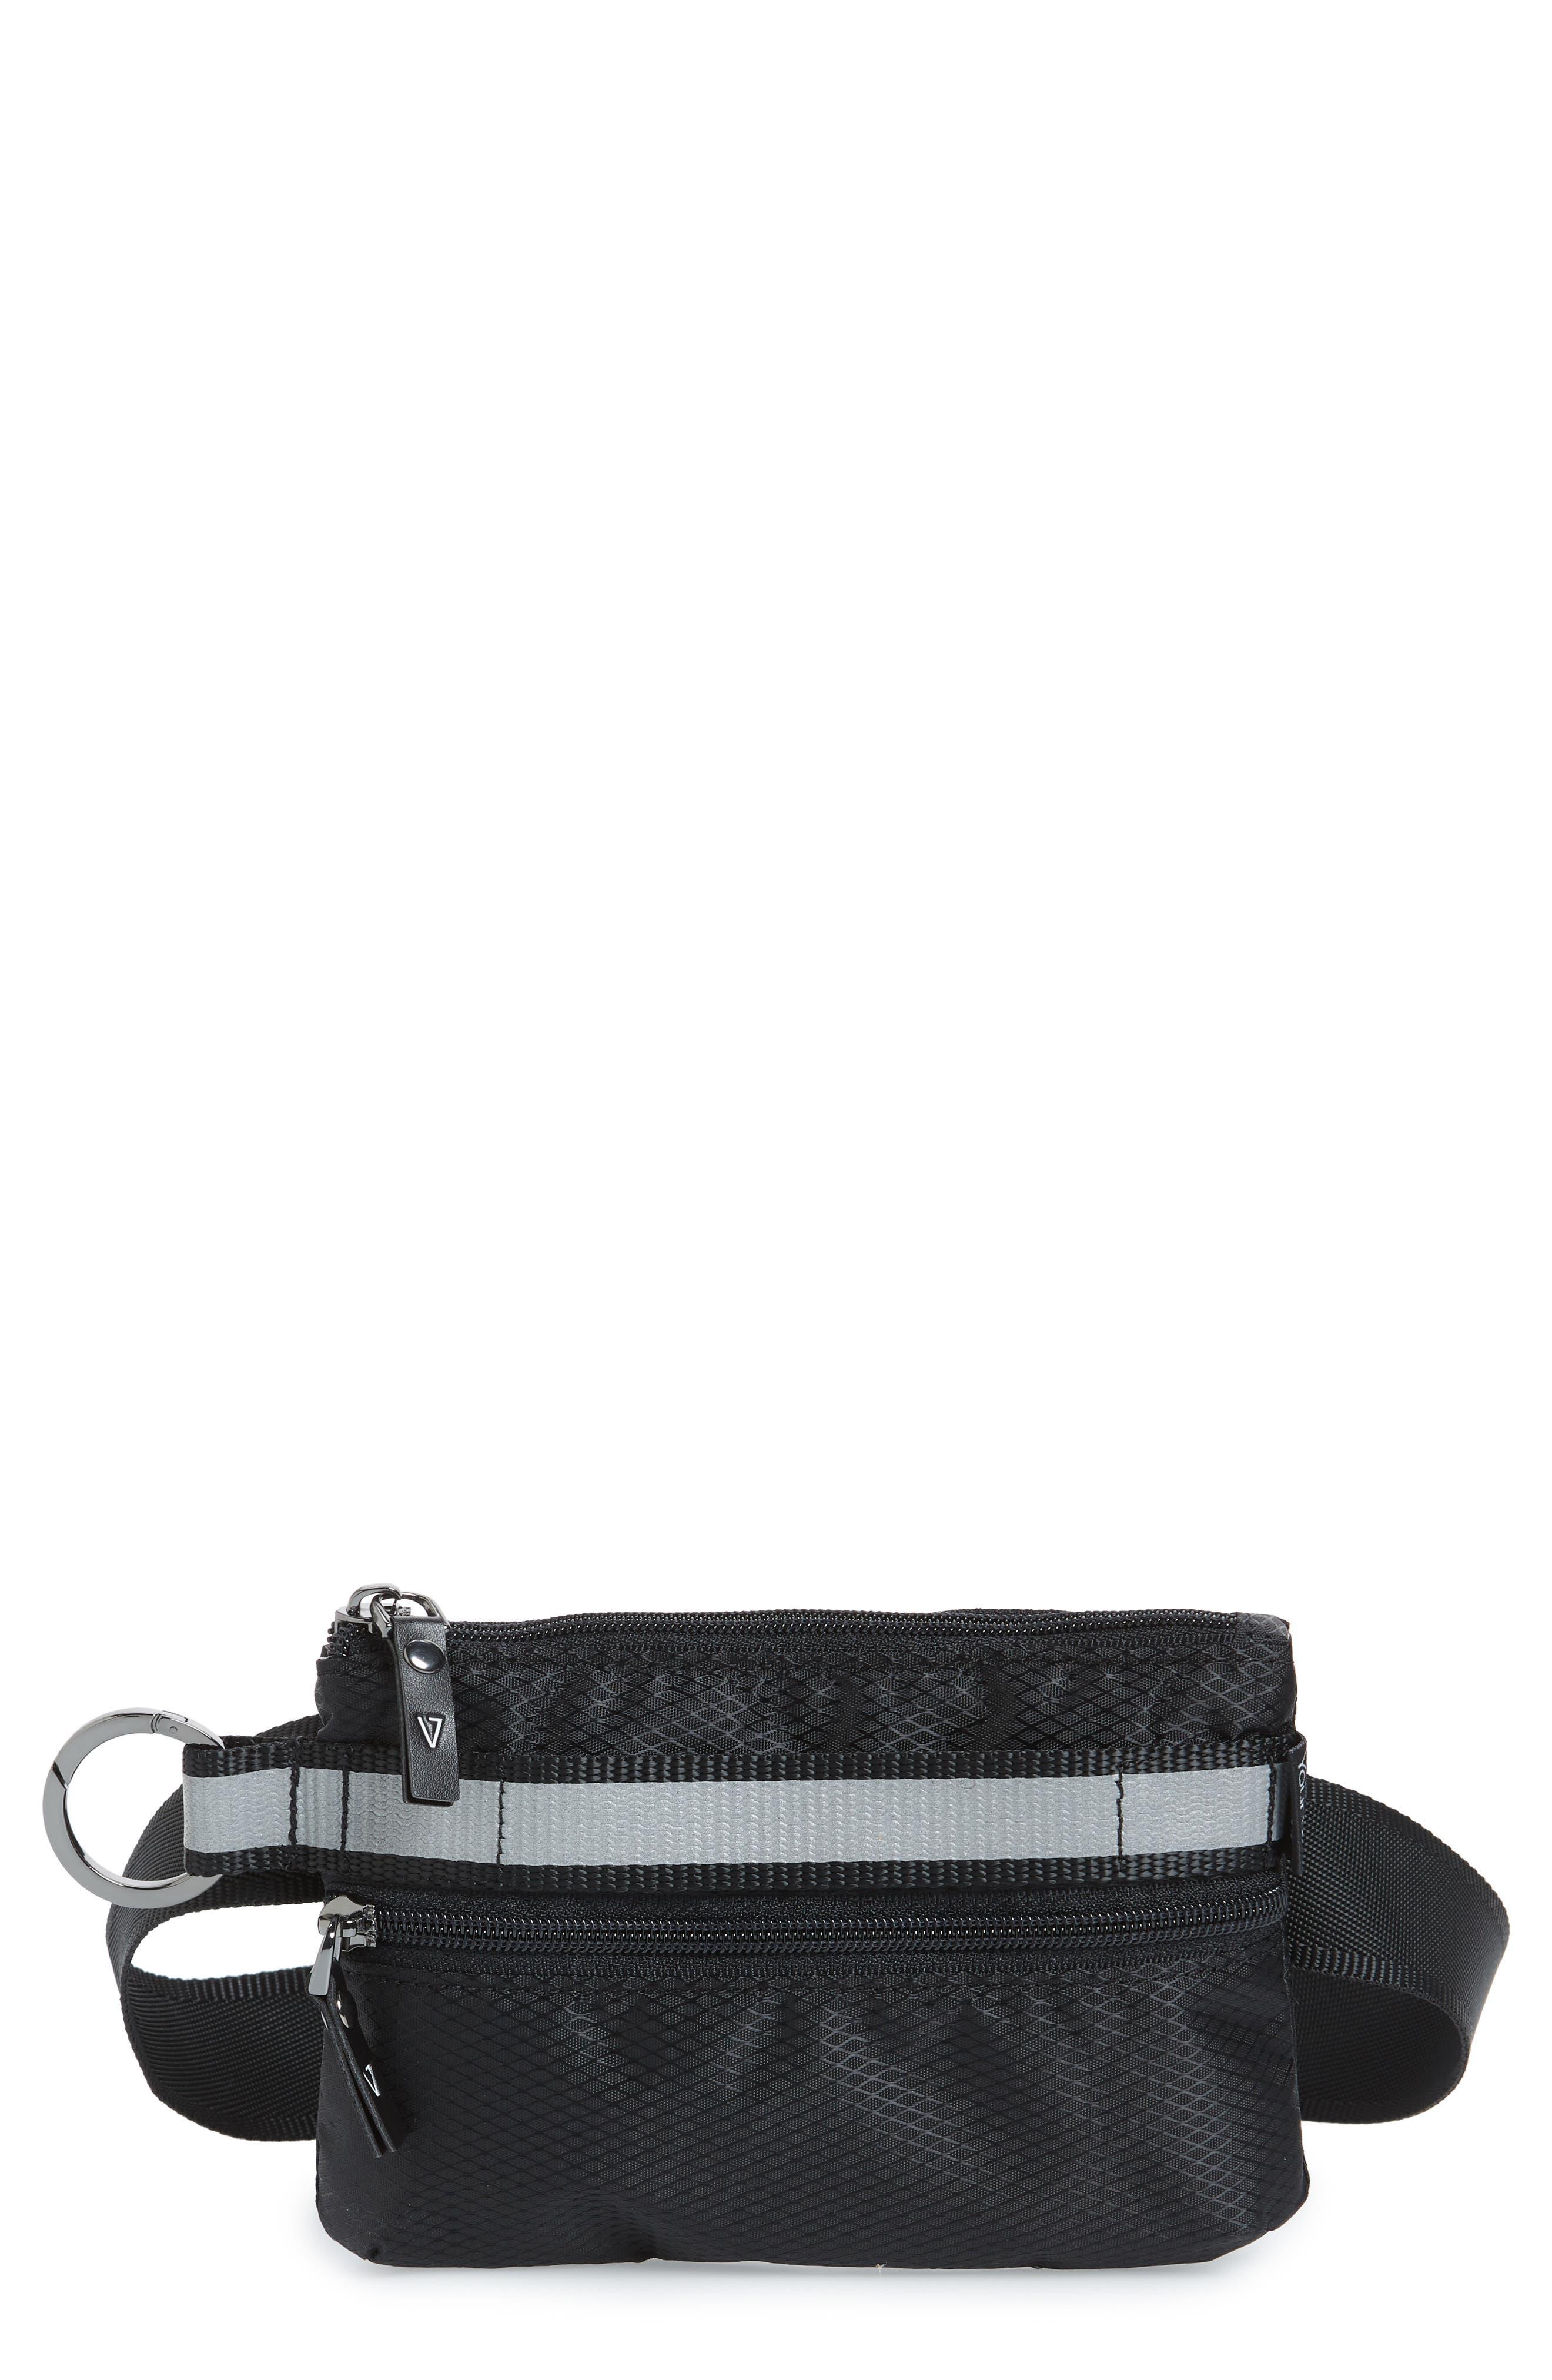 ANDI Urban Clutch Convertible Belt Bag - Black in Black/ Reflective Stripe